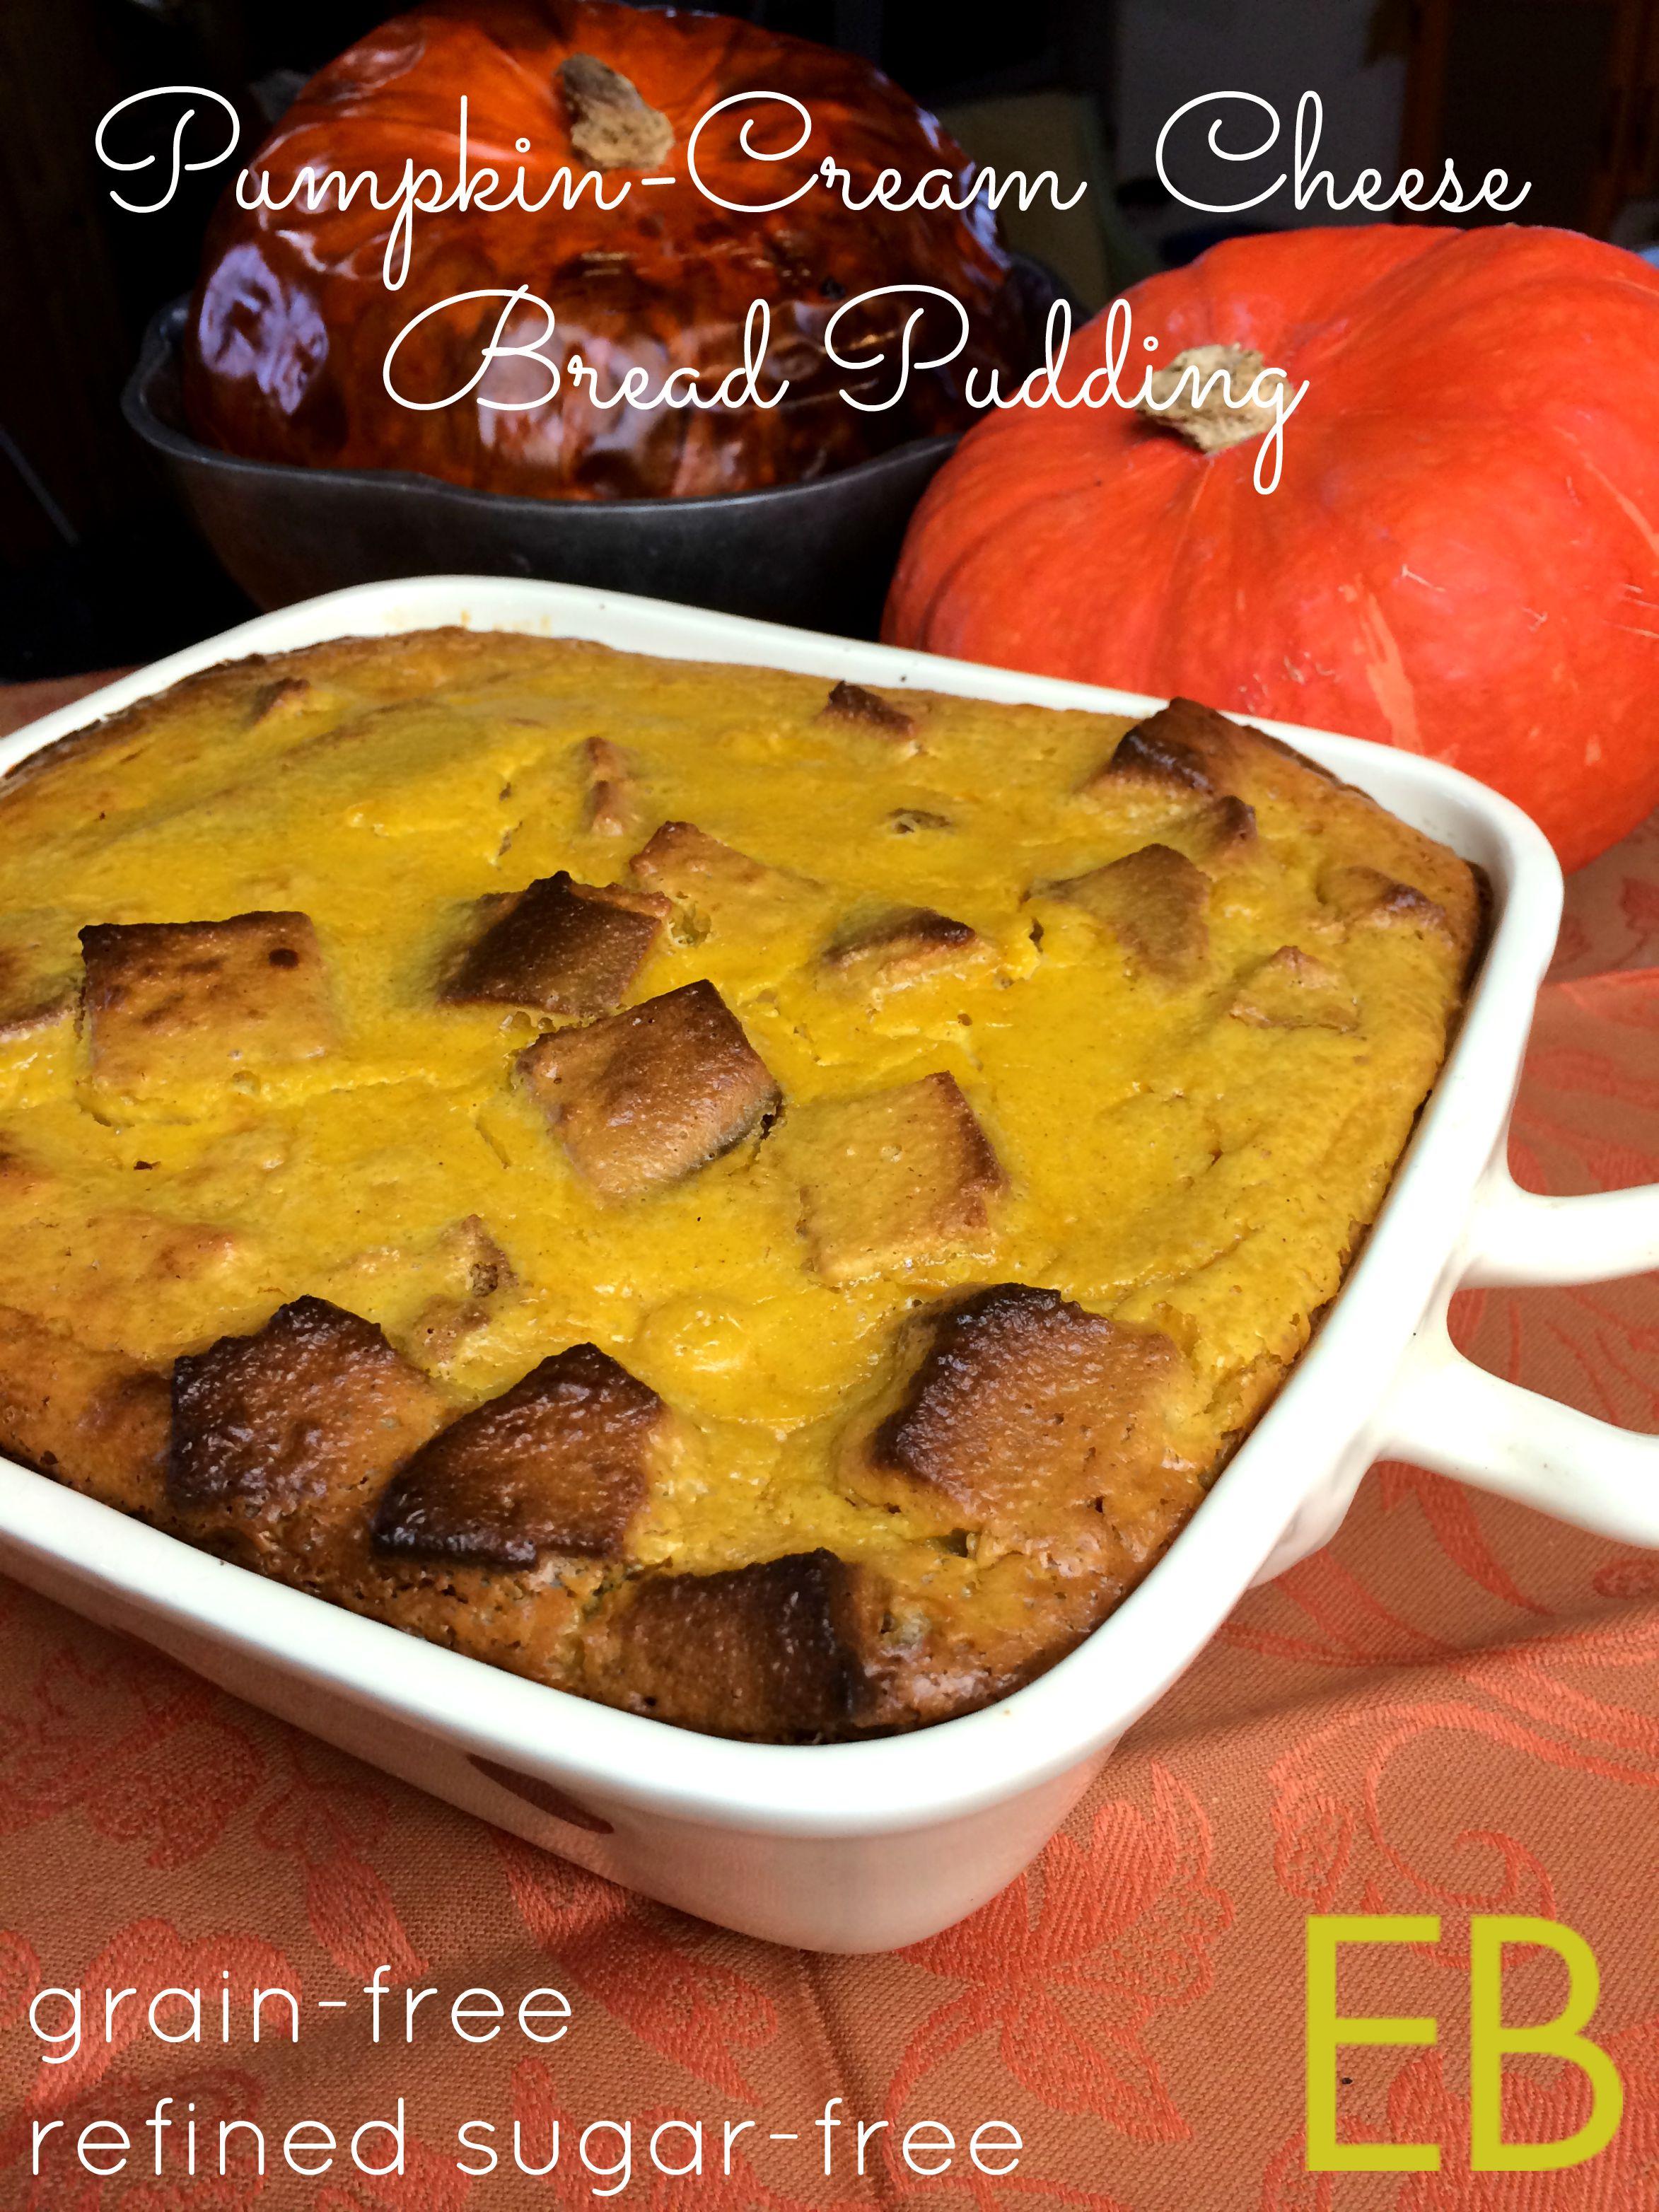 Pumpkin Cream Cheese Bread Pudding